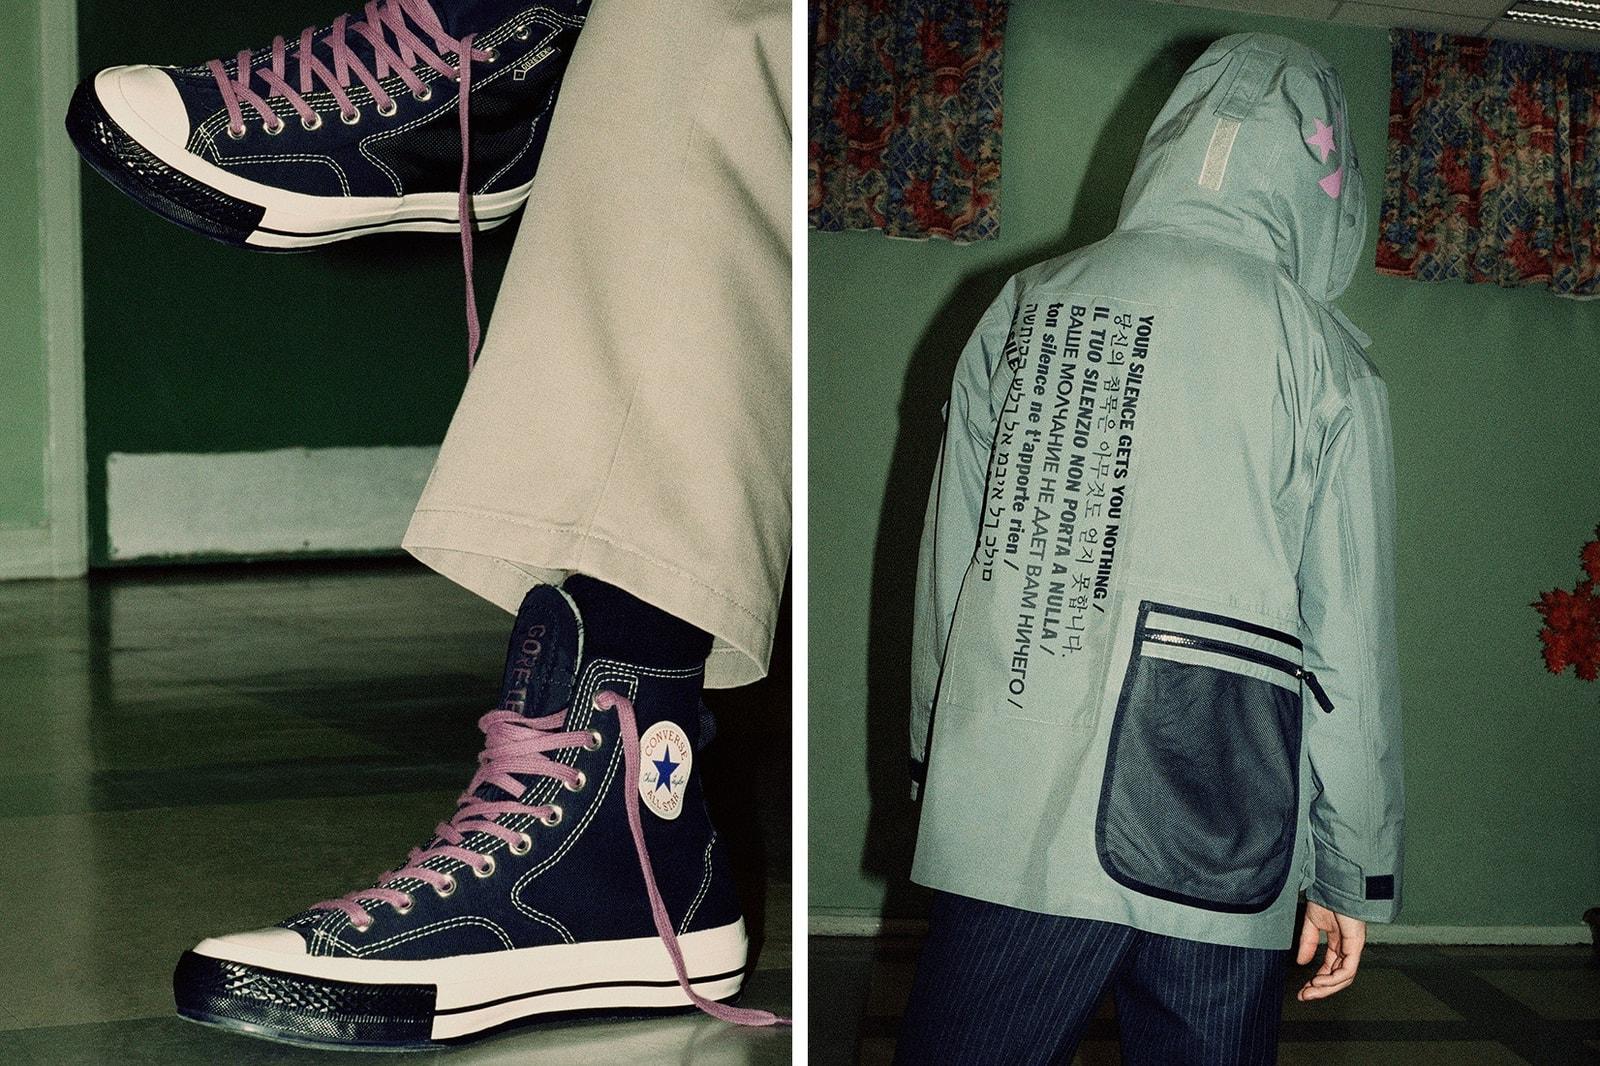 stüssy slam jam converse soulland nike idea books patta vans A-COLD WALL* size? Adidas originals ashish km20 Dior homme hanon balenciaga